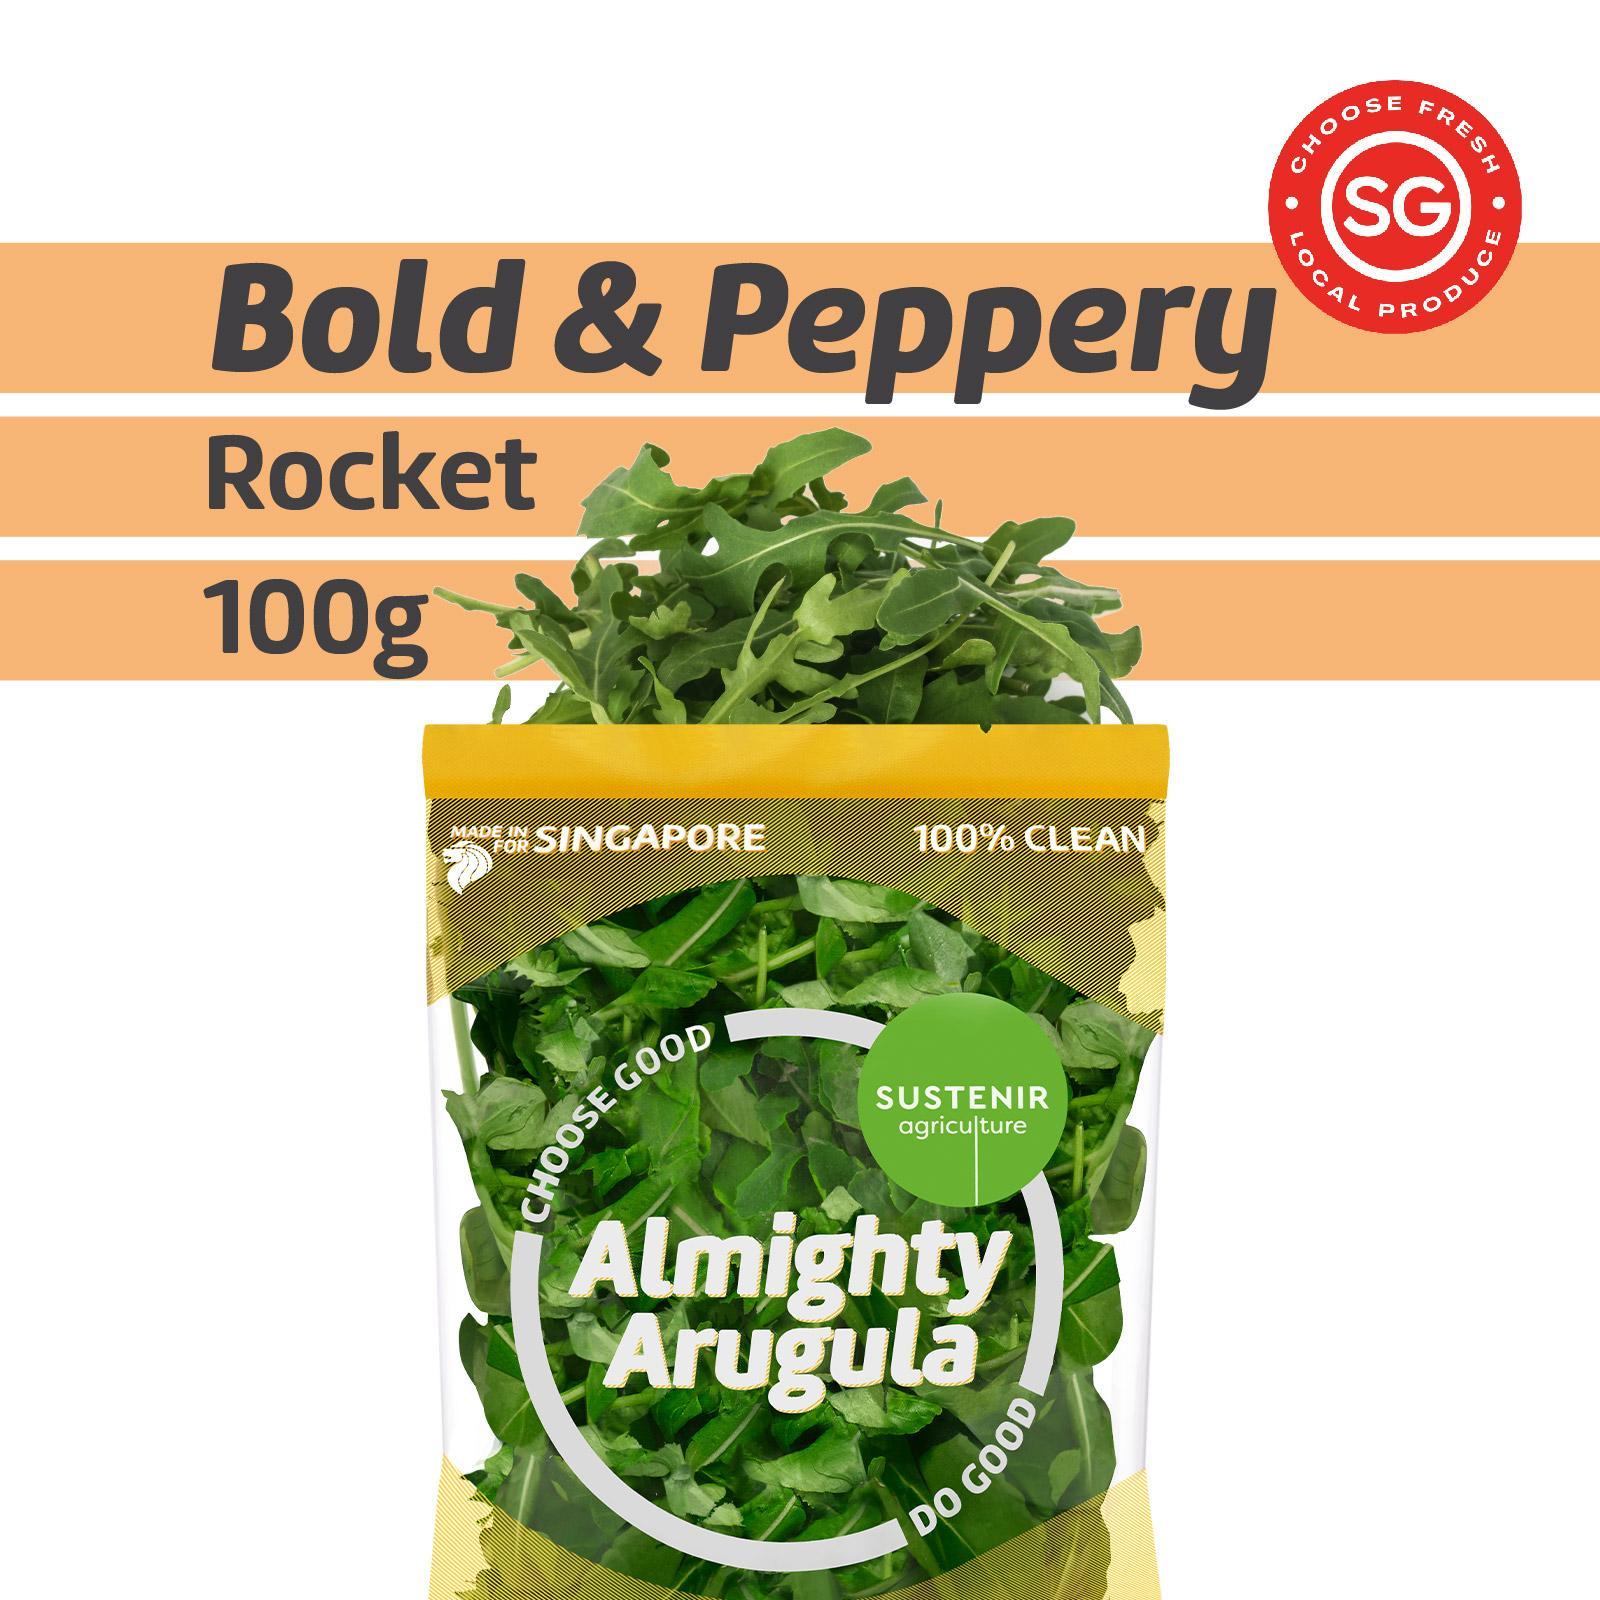 Sustenir Arugula Rocket Salad